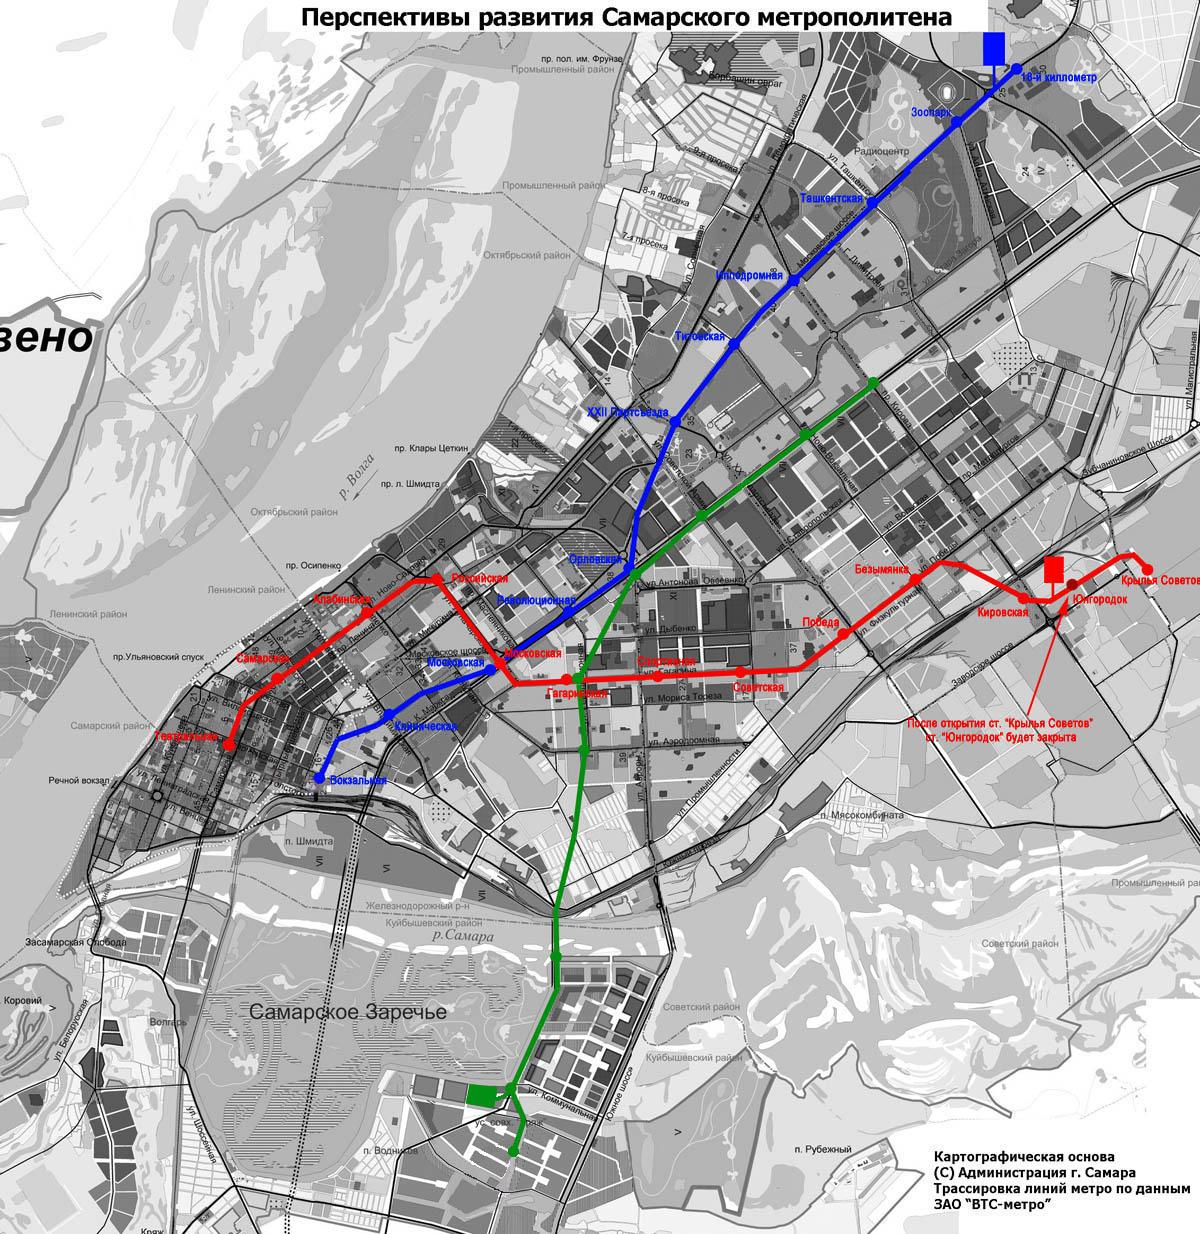 Представлена концептуальная схема развития бакметрополитена схема